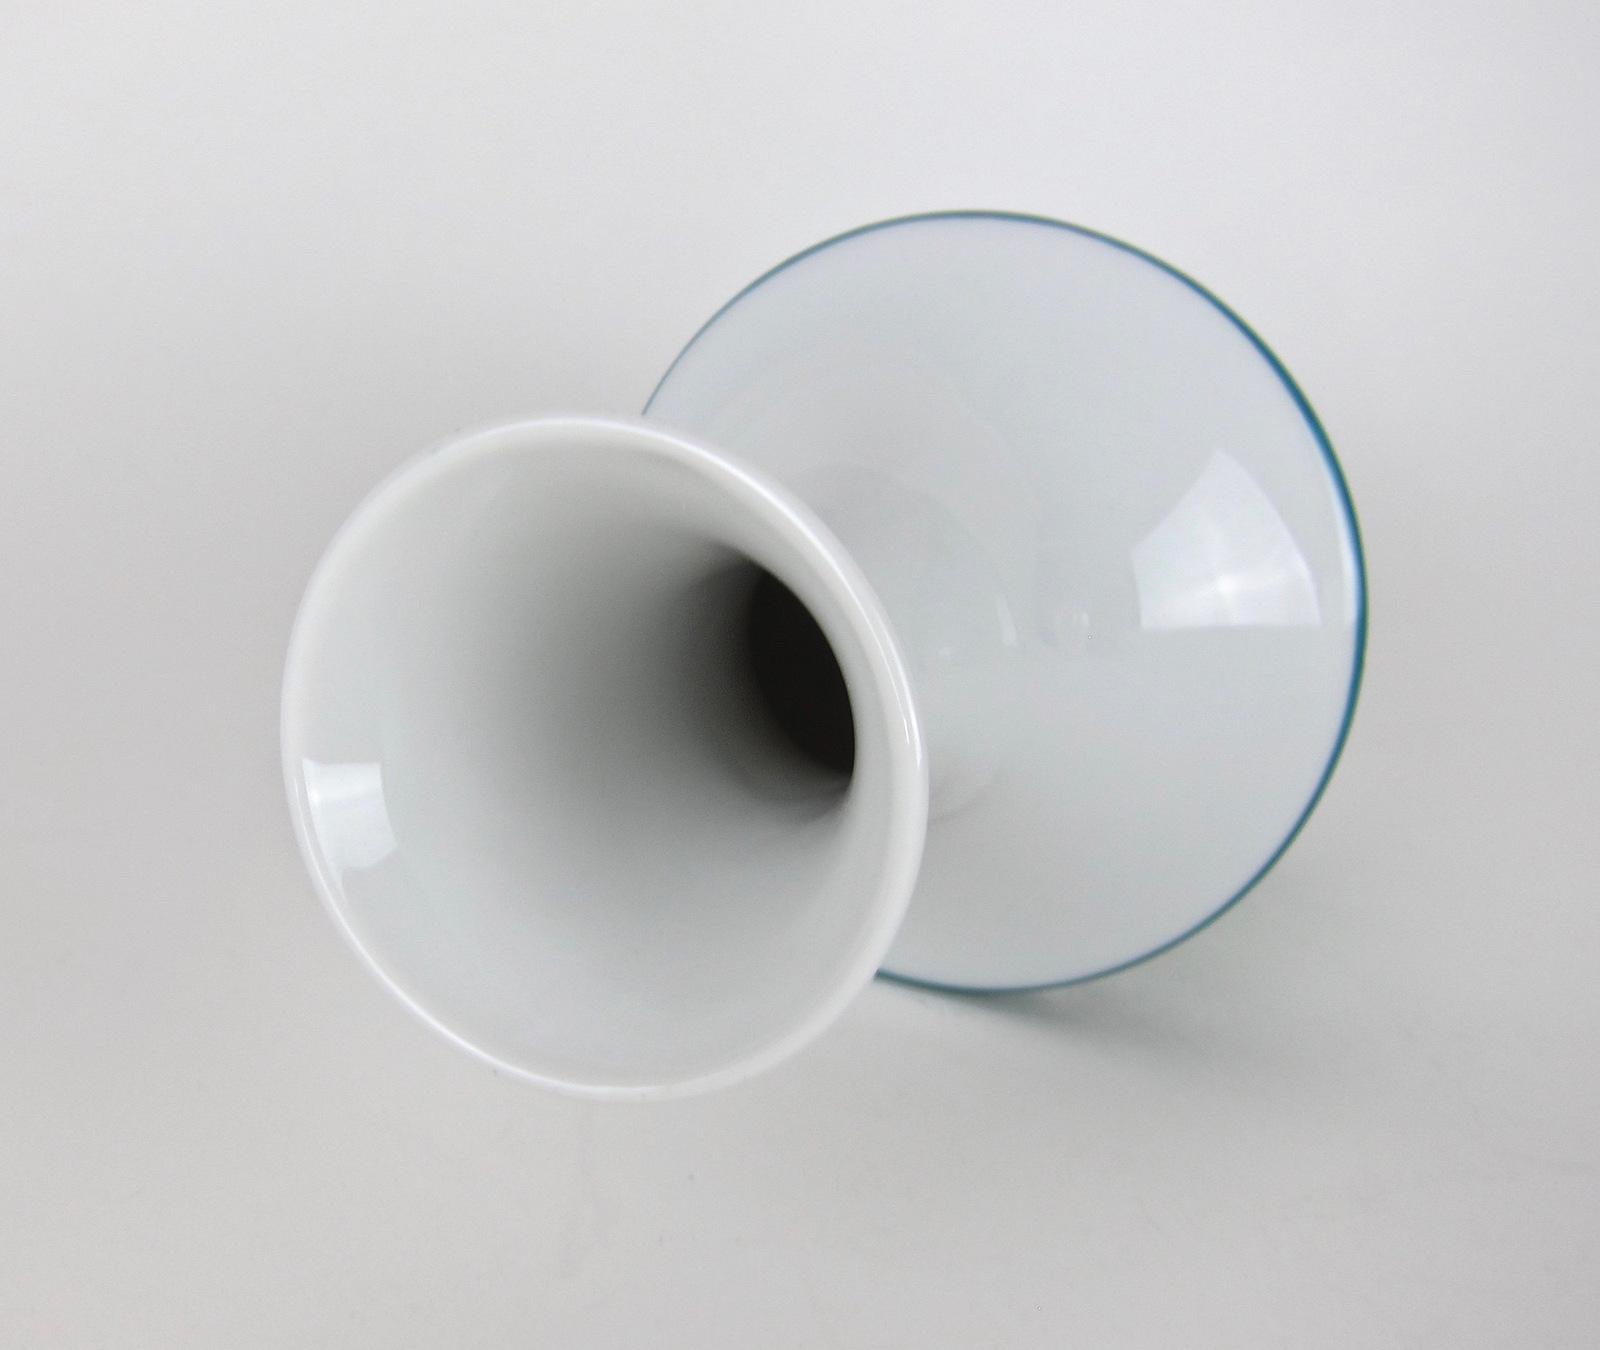 Midcentury Spahr & Co. Silver Overlay German Edelstein Porcelain Vase